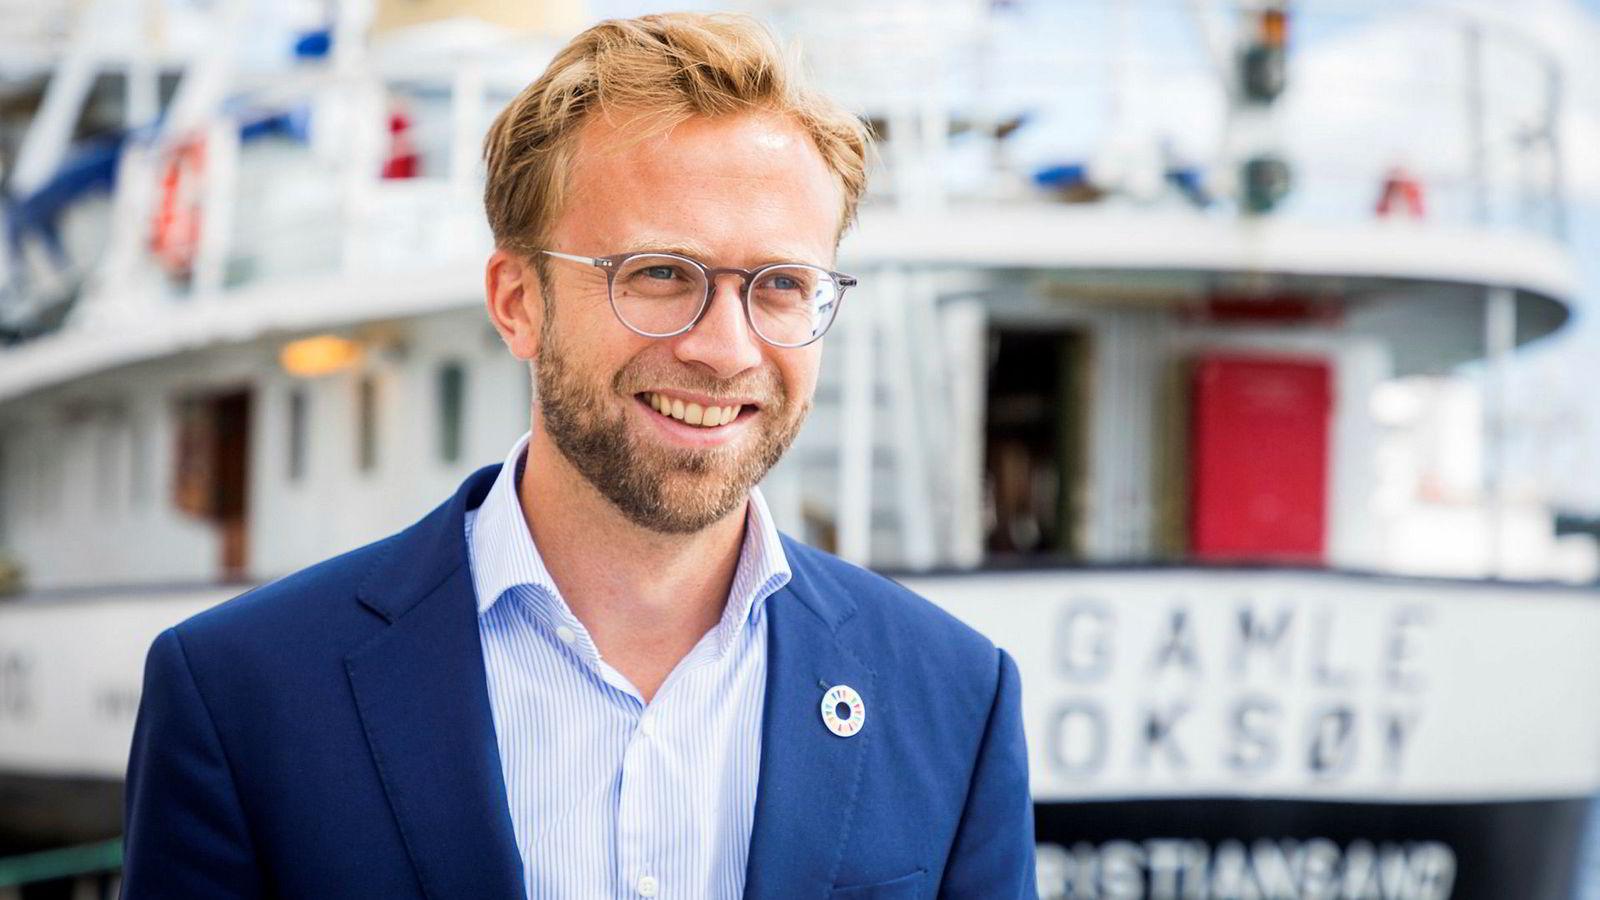 Digitaliseringsminister og regjeringens rikeste, Nikolai Astrup, tjente millioner også i 2018. Her er han på kaia i Arendal i forbindelse med Arendalsuka.